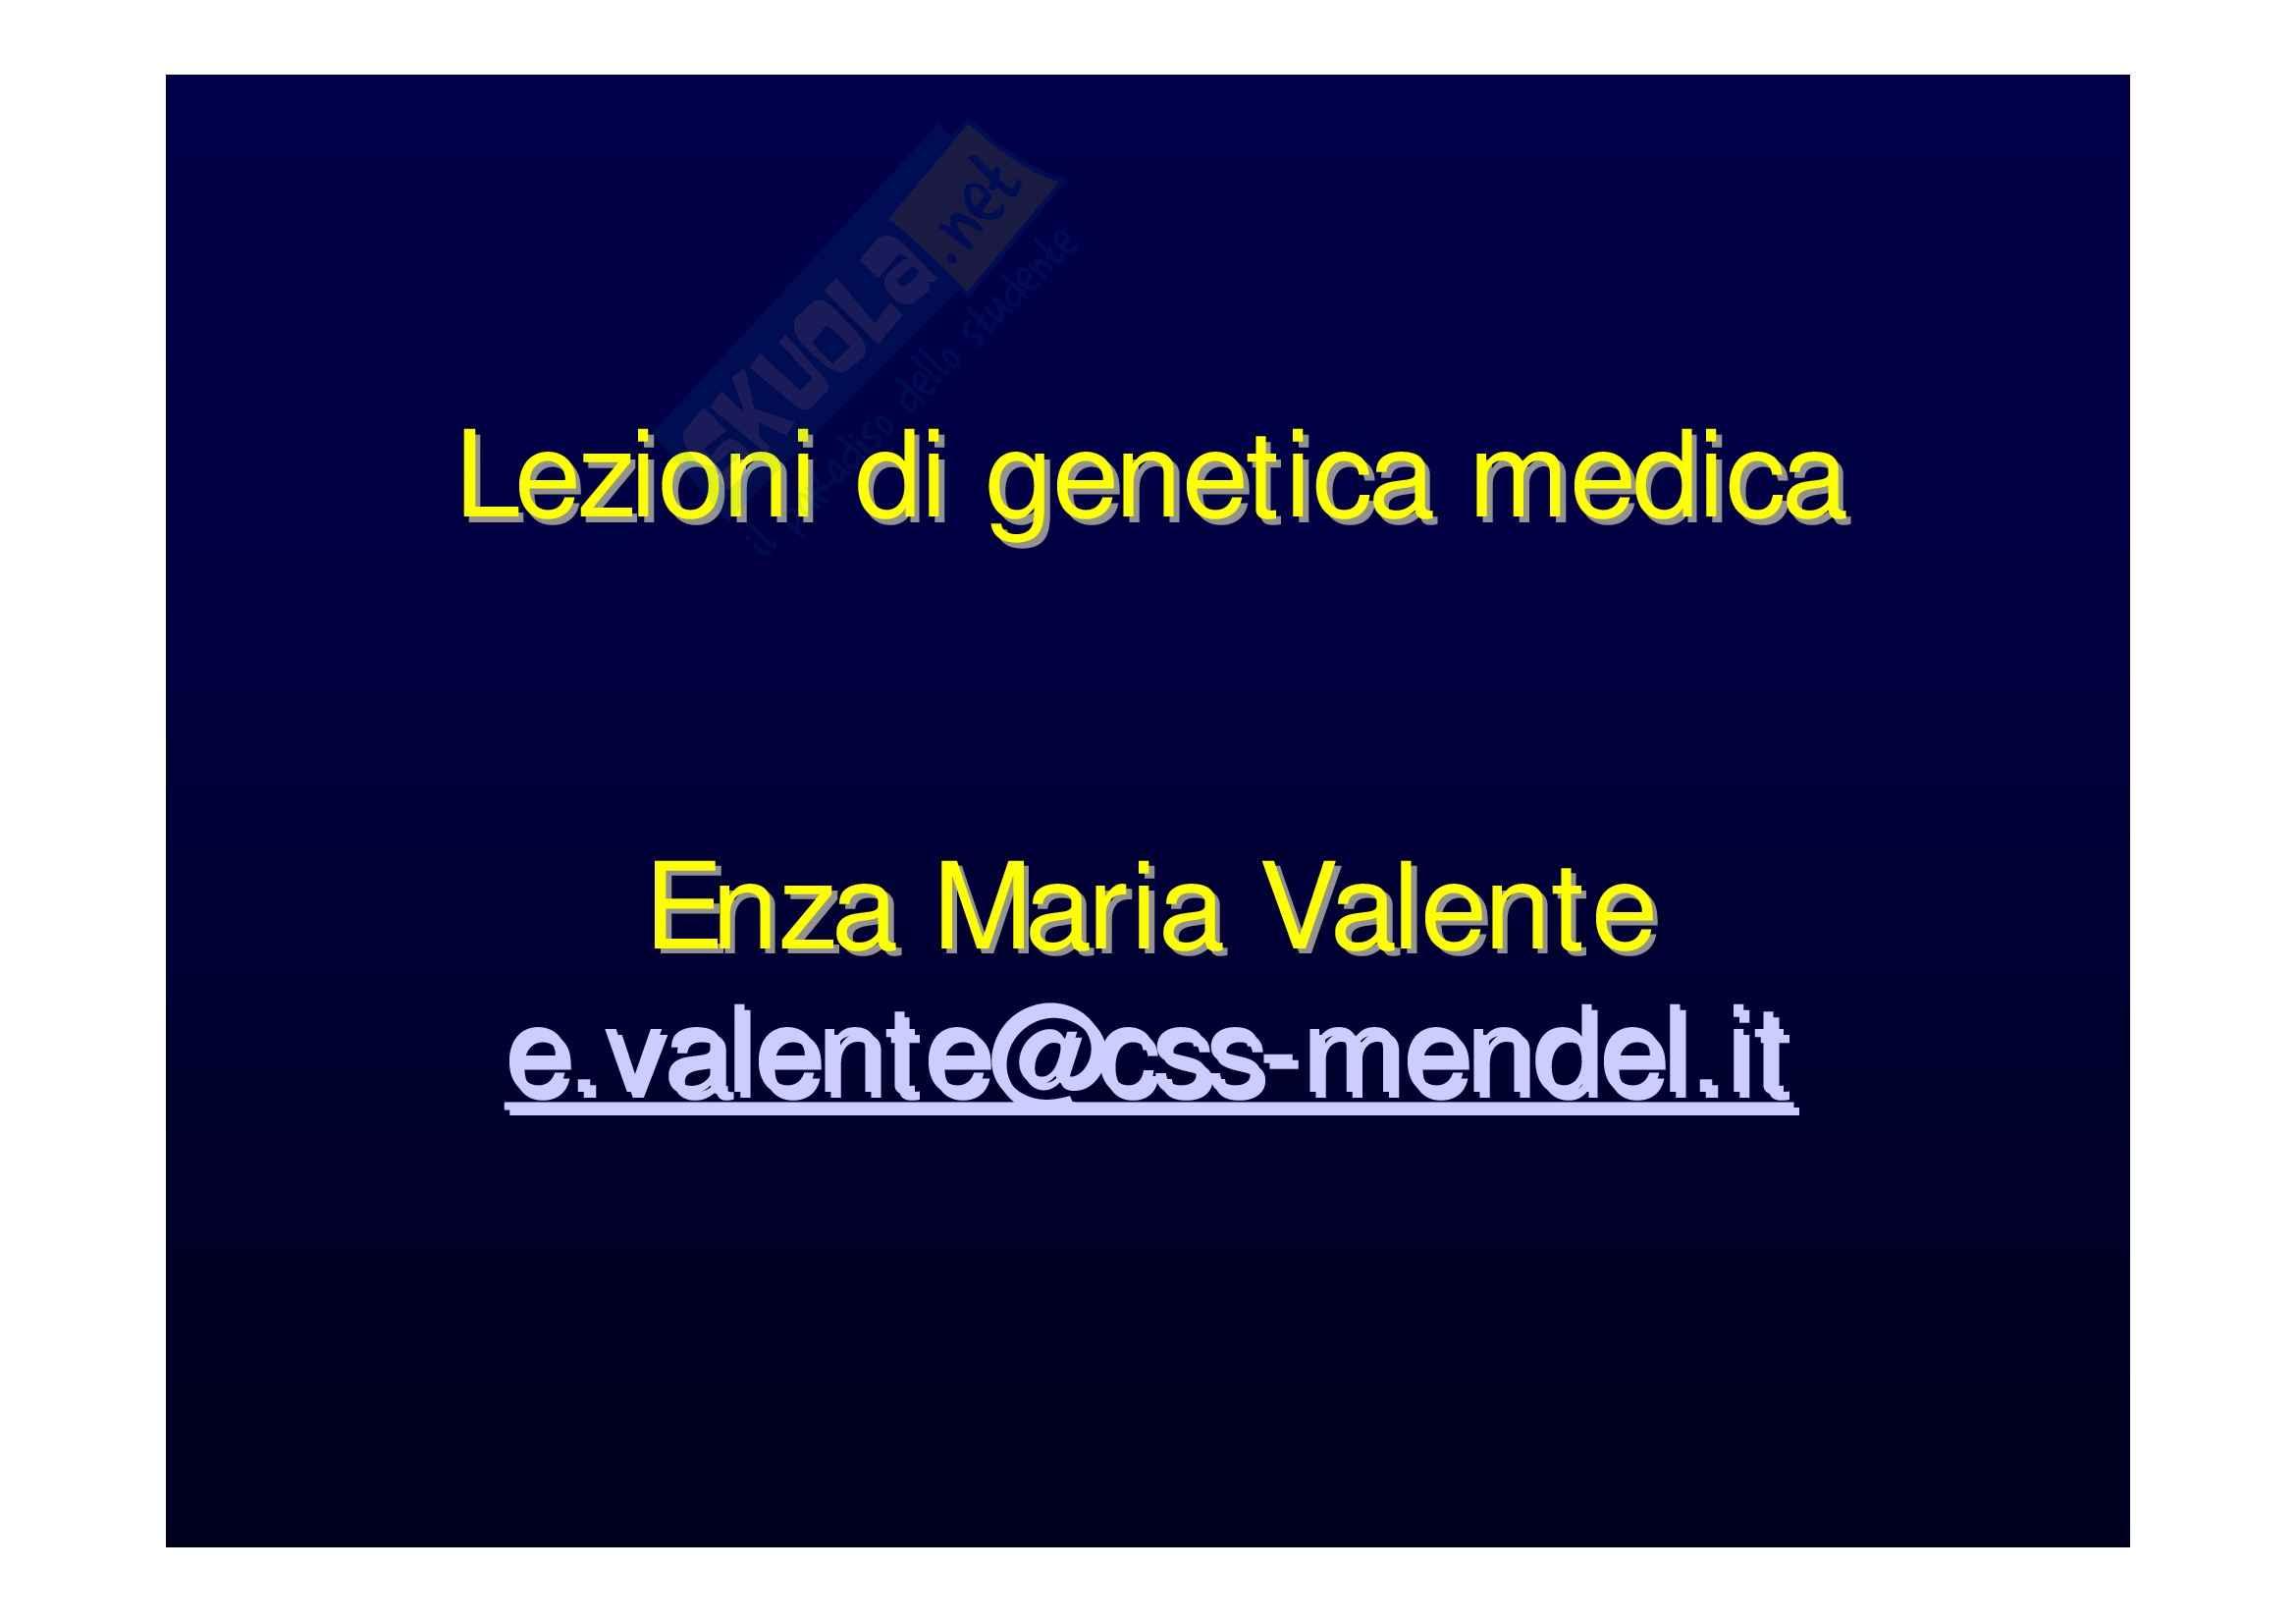 Genetica medica - lezioni